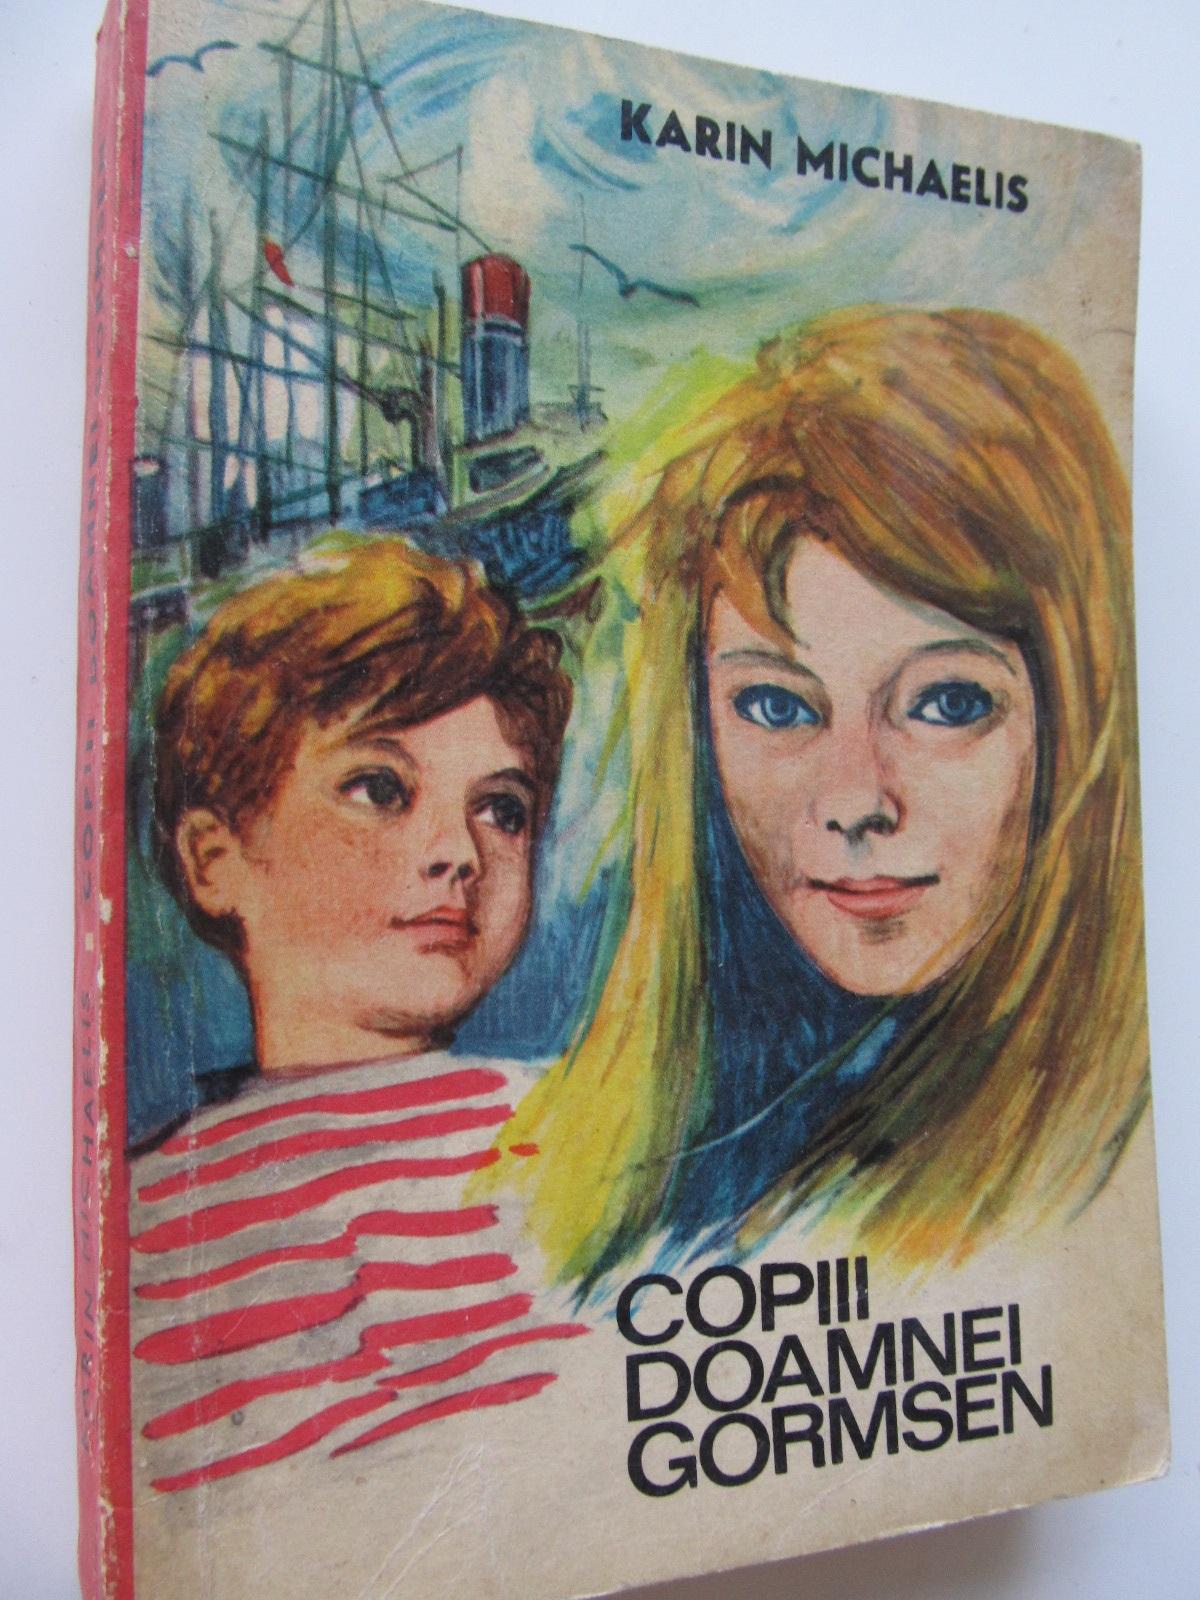 Carte Copii doamnei Gormsen - Karin Michaelis